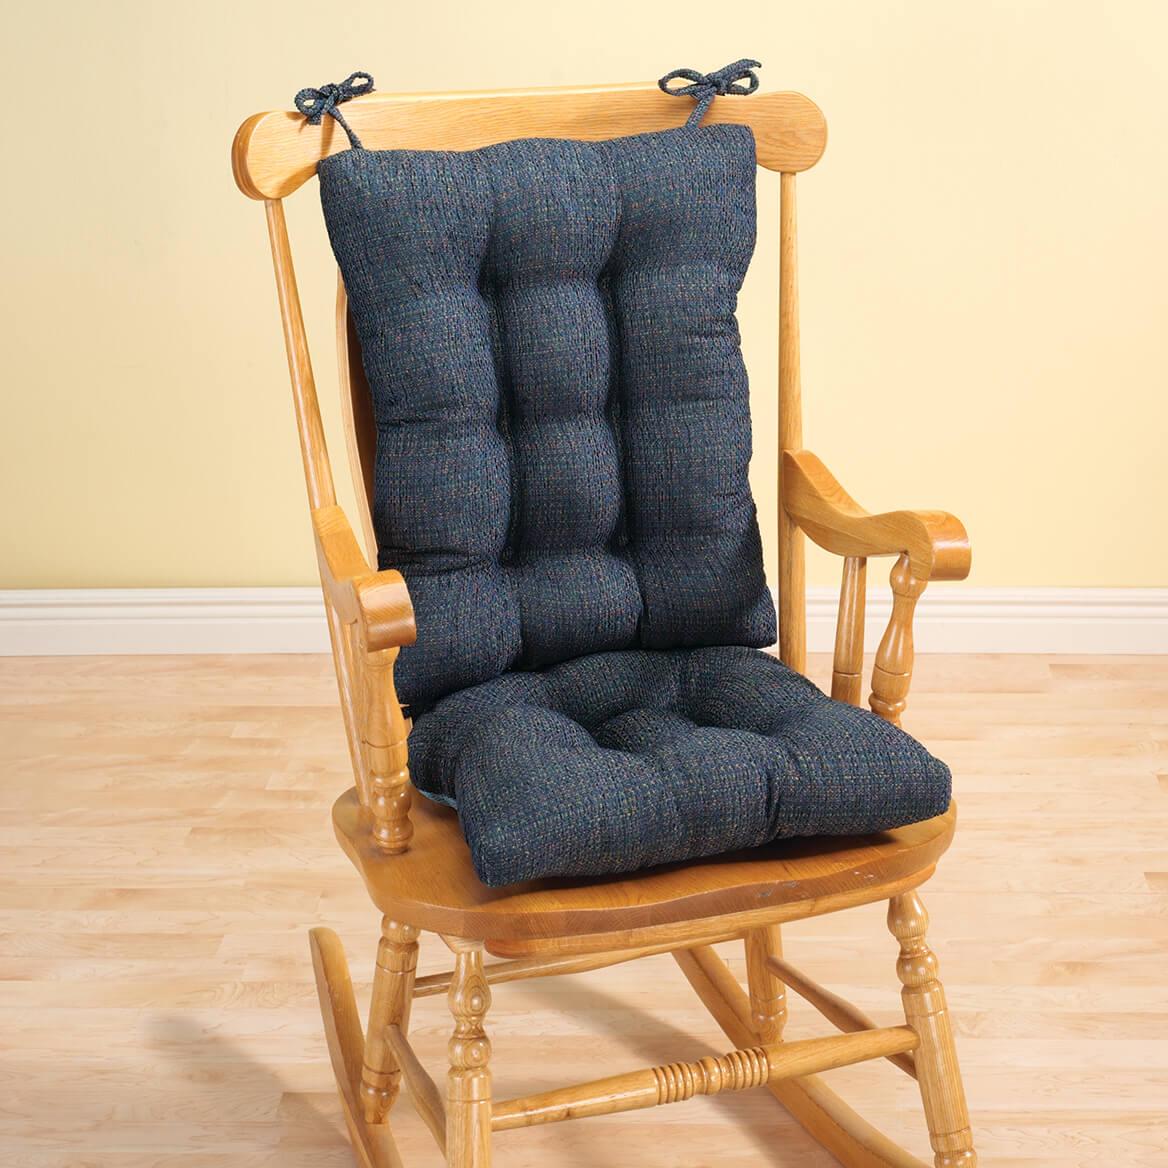 buy rocking chair outdoor folding chairs kmart tyson cushion set rocker cushions miles